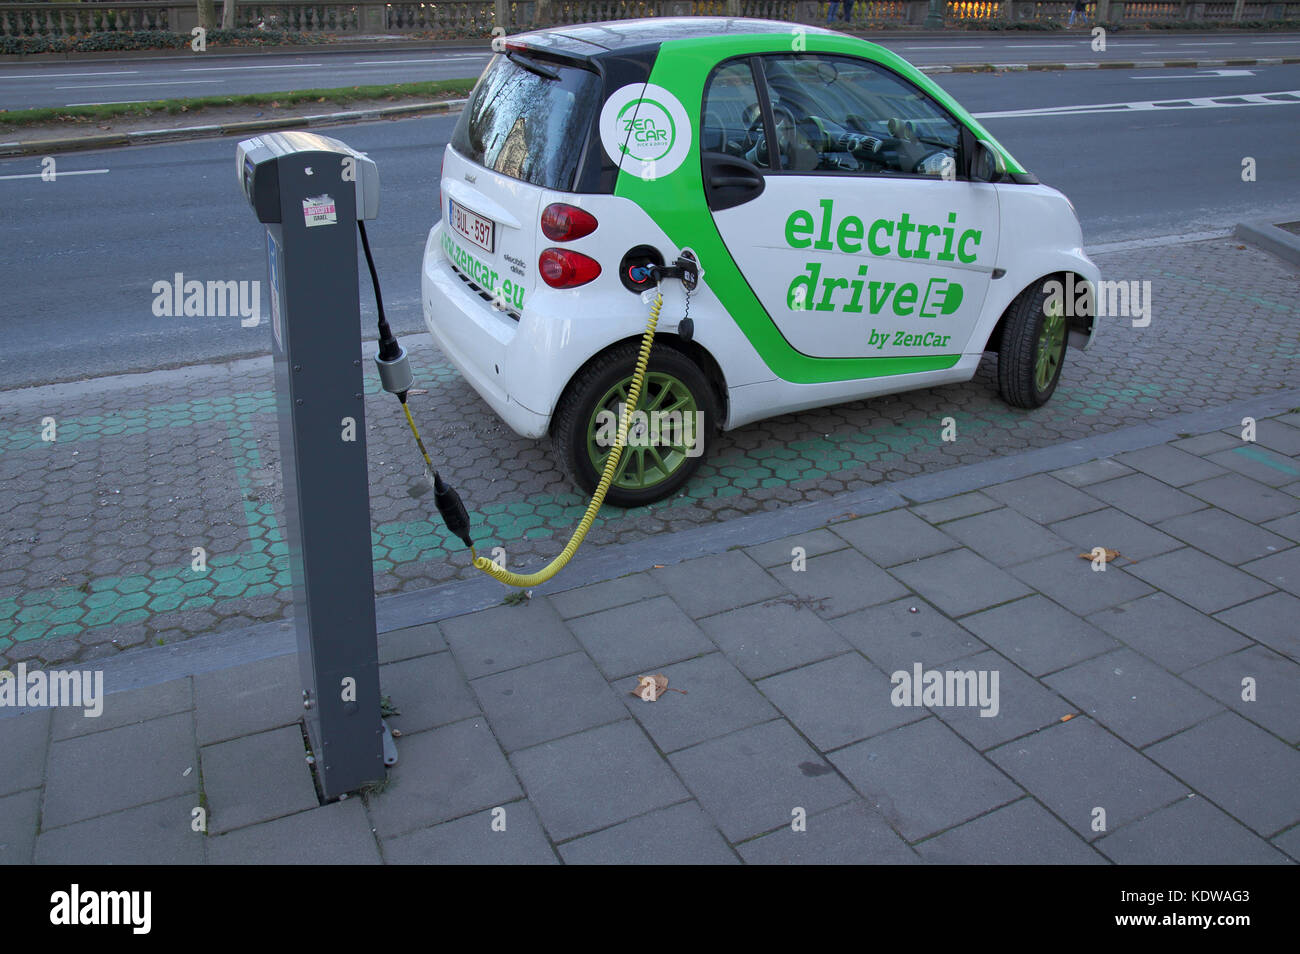 recharging an electric car in brussels belgium - Stock Image